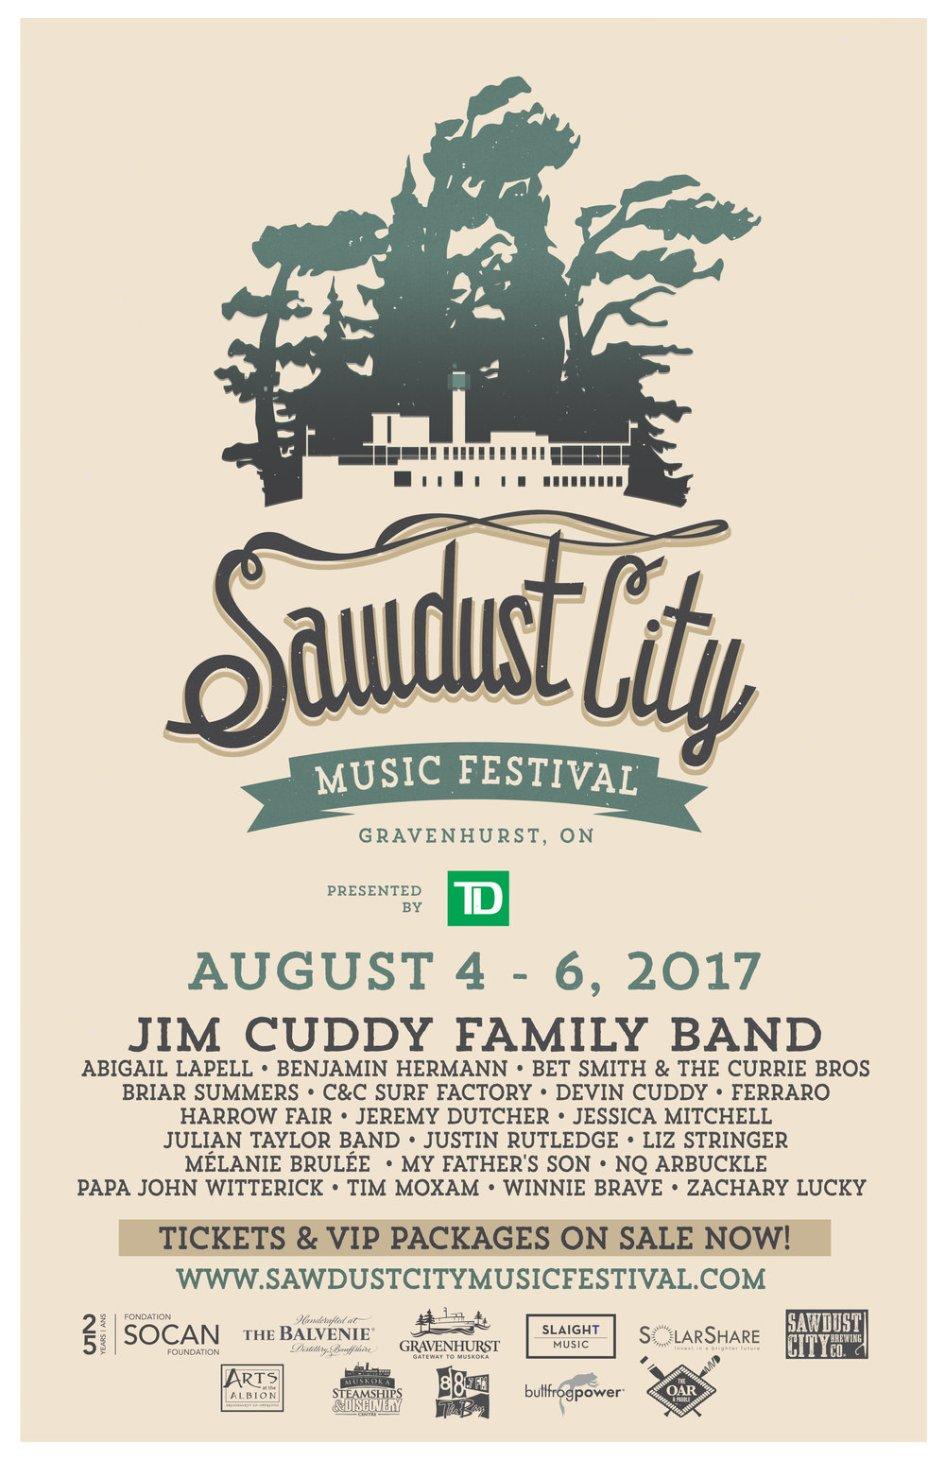 Sawdust City Music Festival